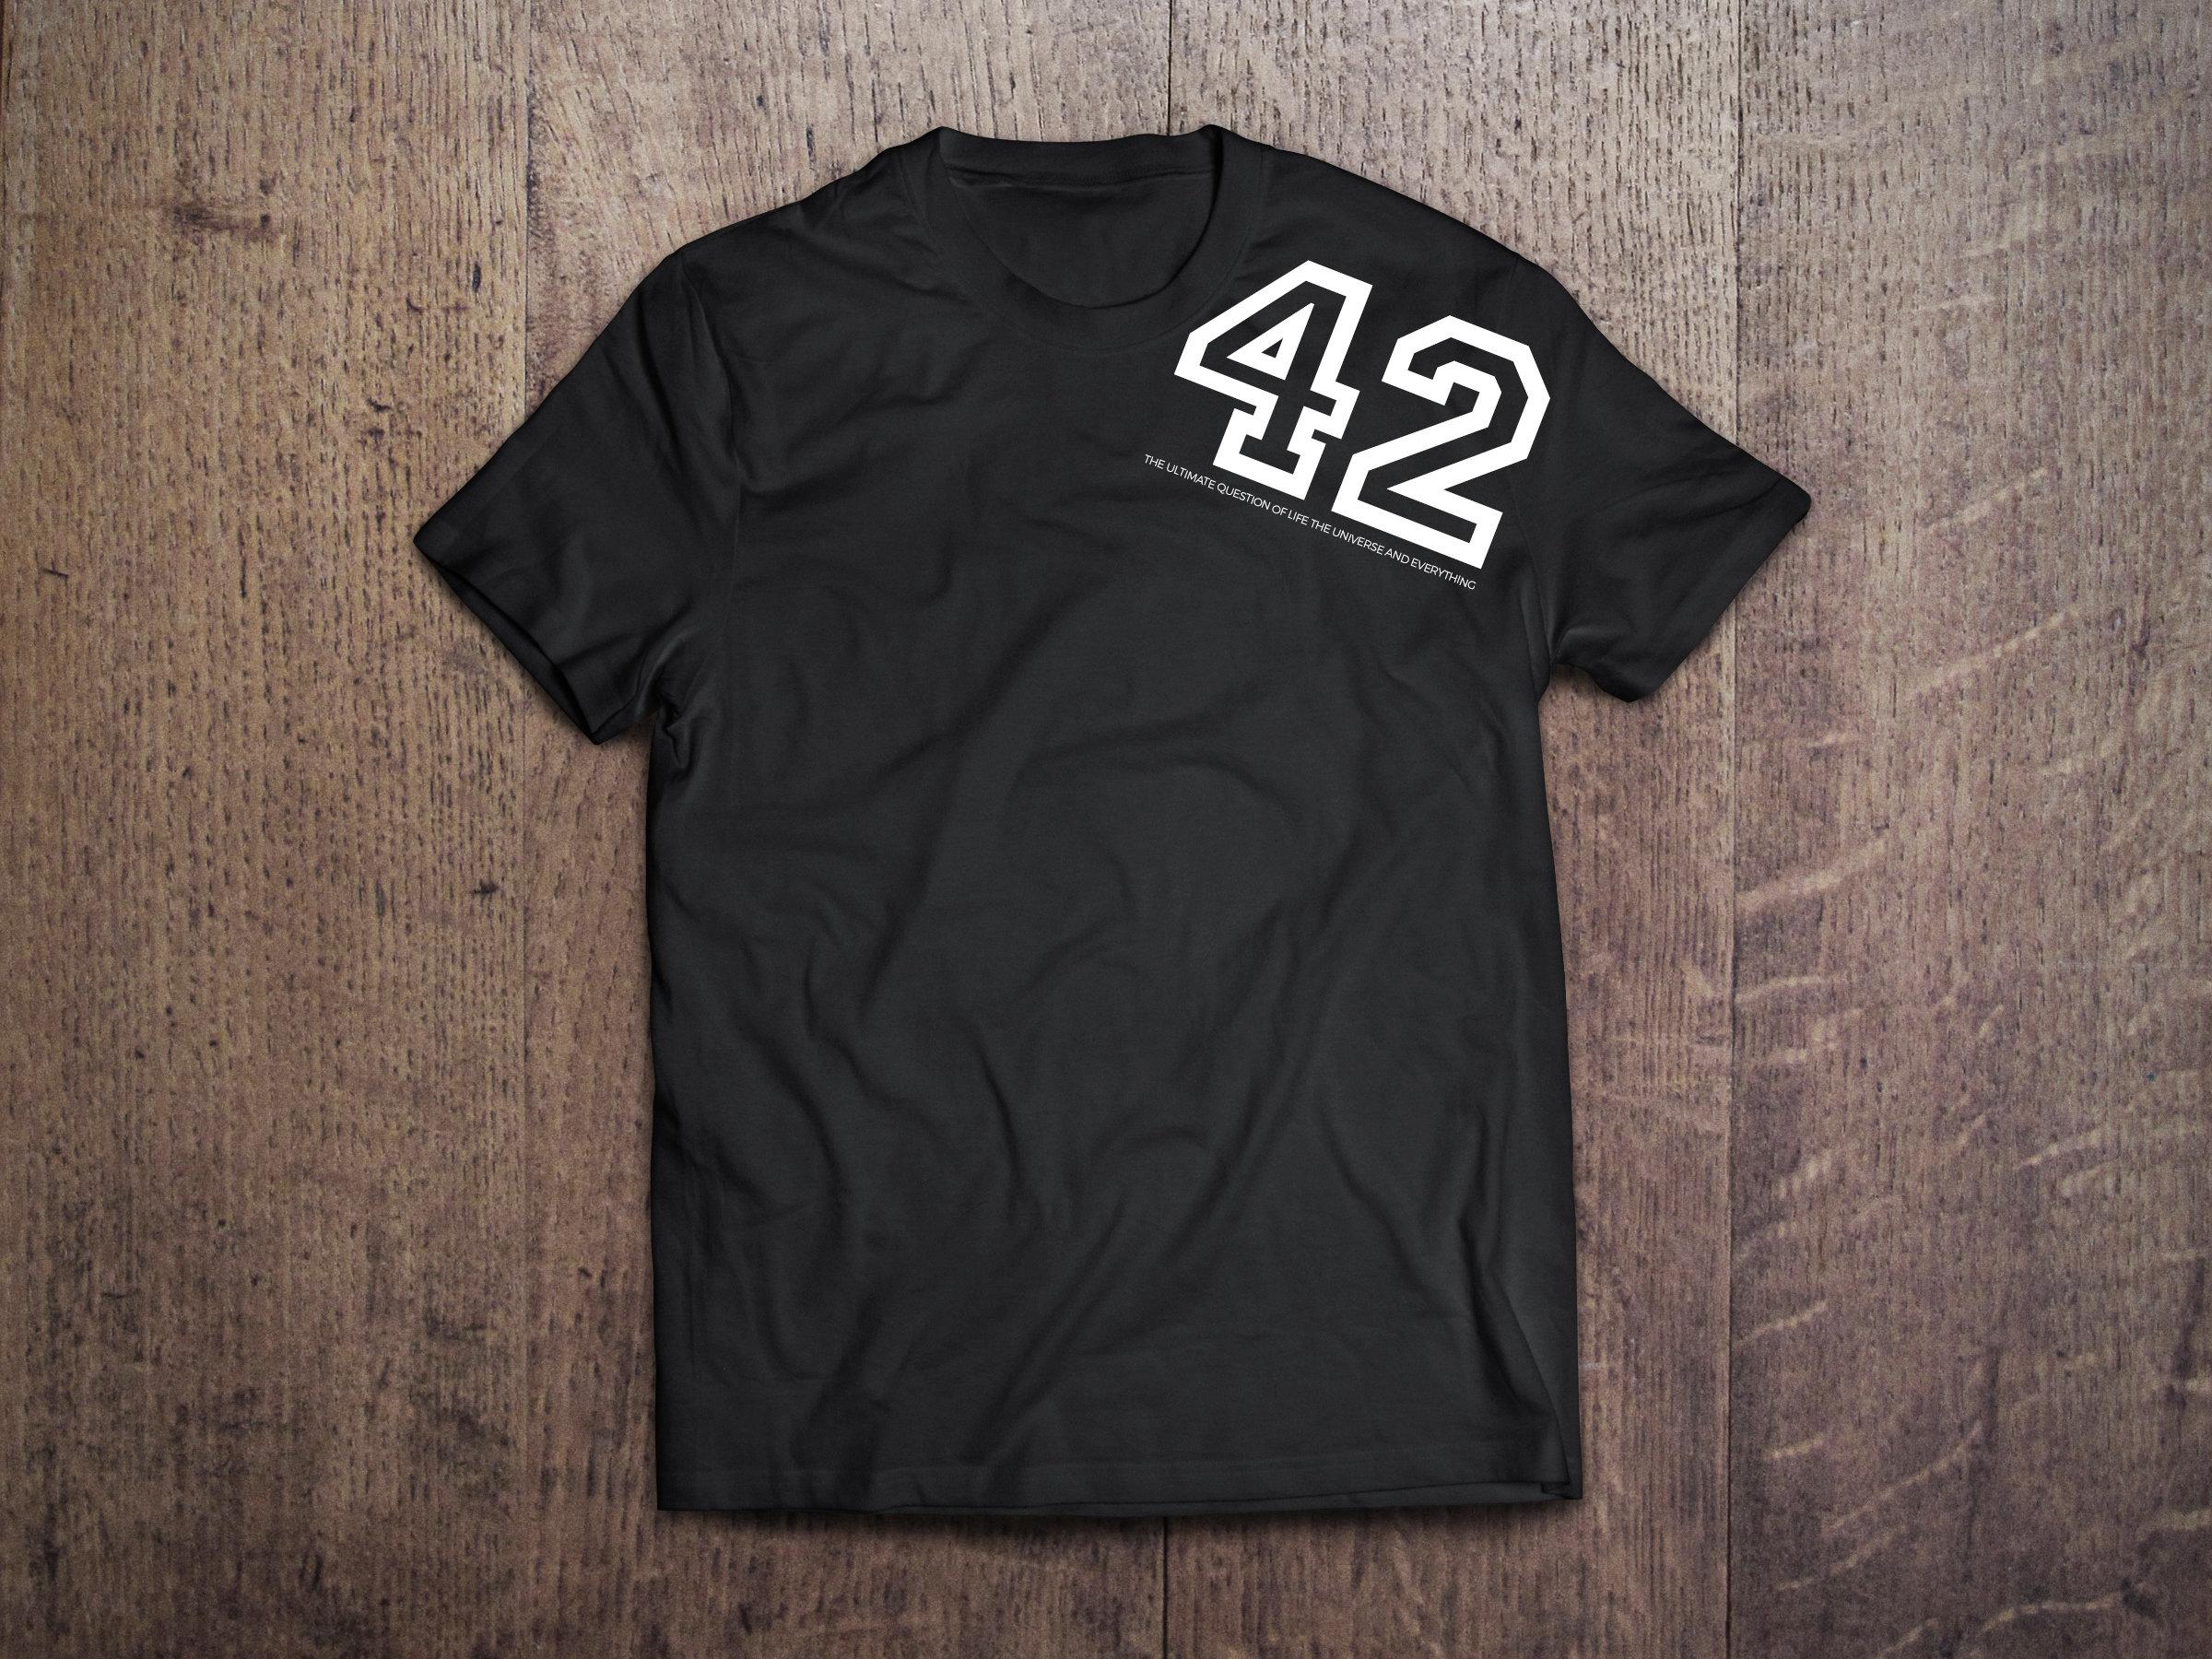 42 College 42 College Shoulder Tshirt